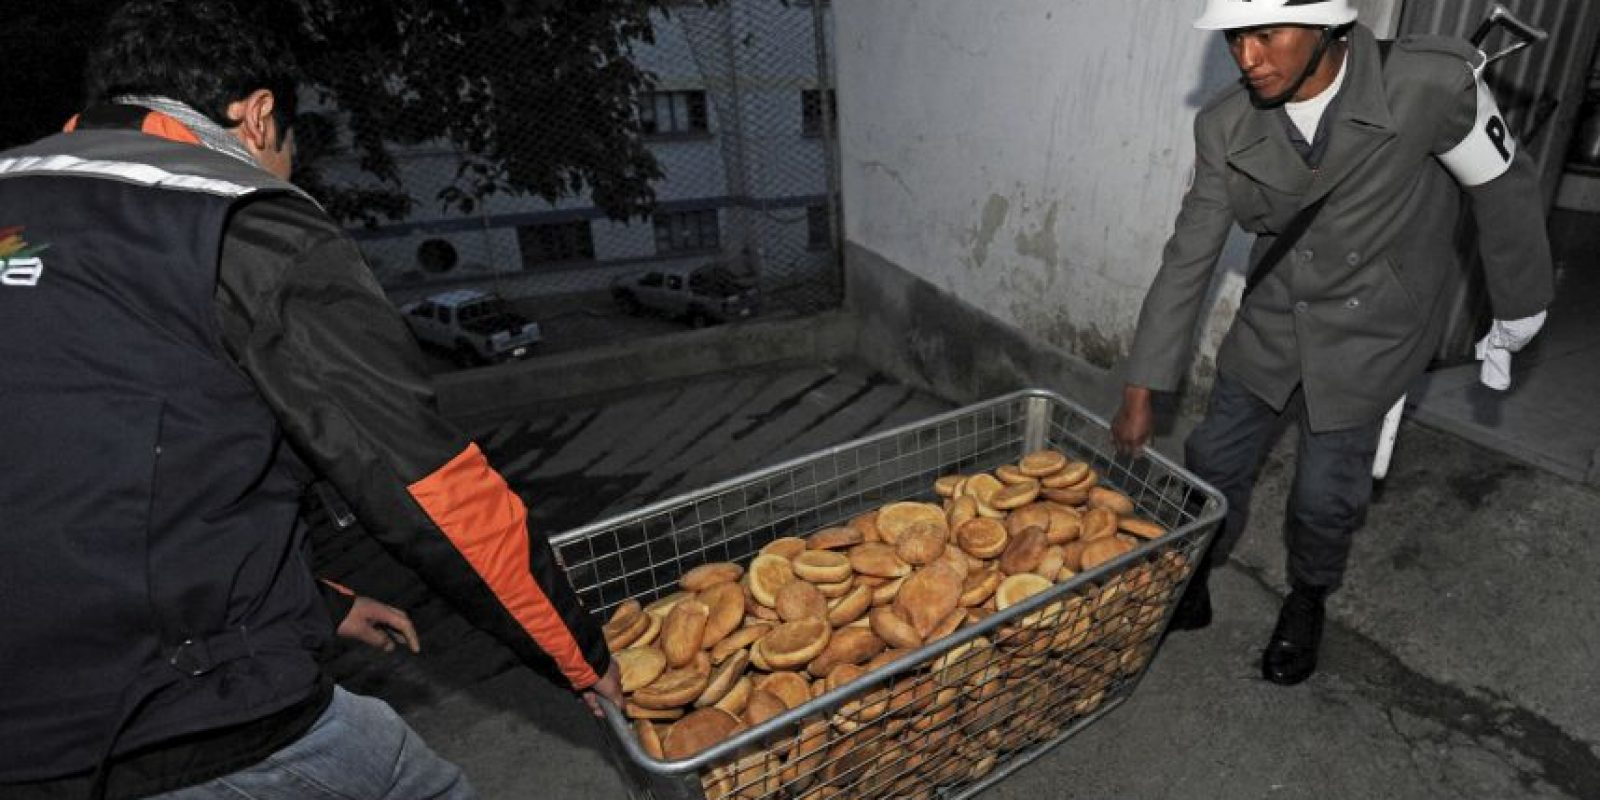 Militares de siete tropas producen alrededor de 75 mil piezas de pan diarias. Foto:AFP